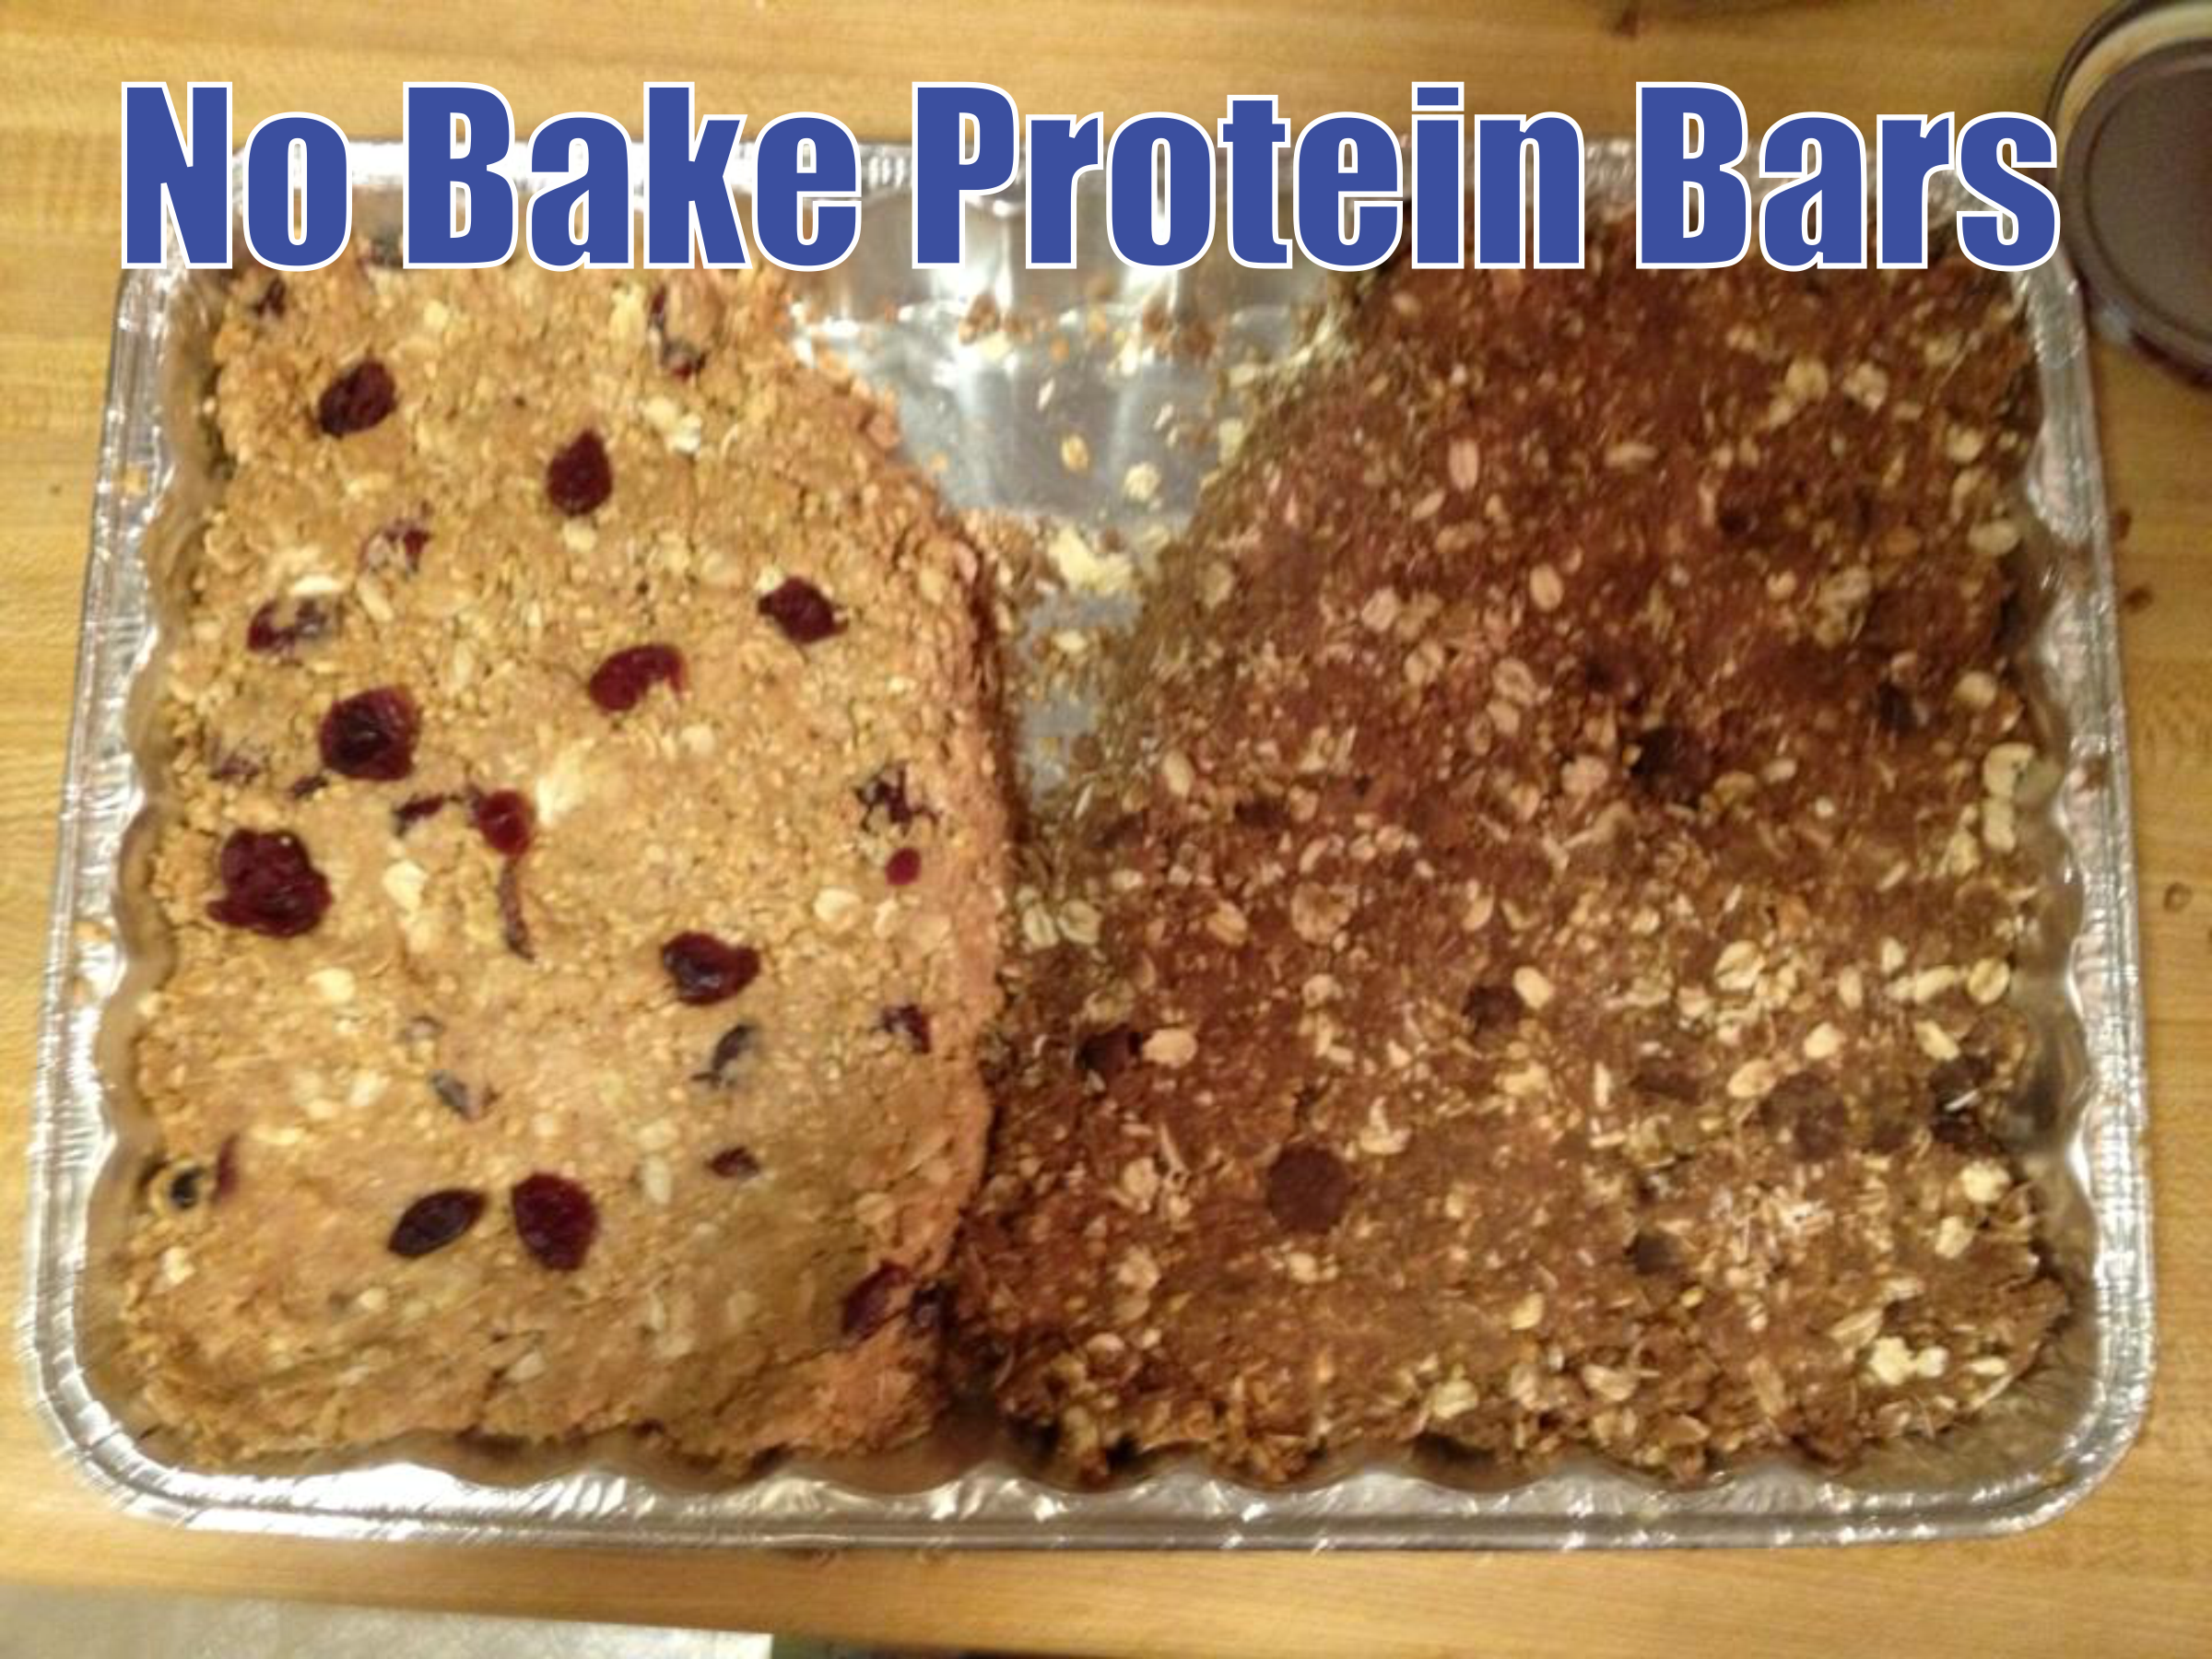 Recipe - No Bake Protein Bars